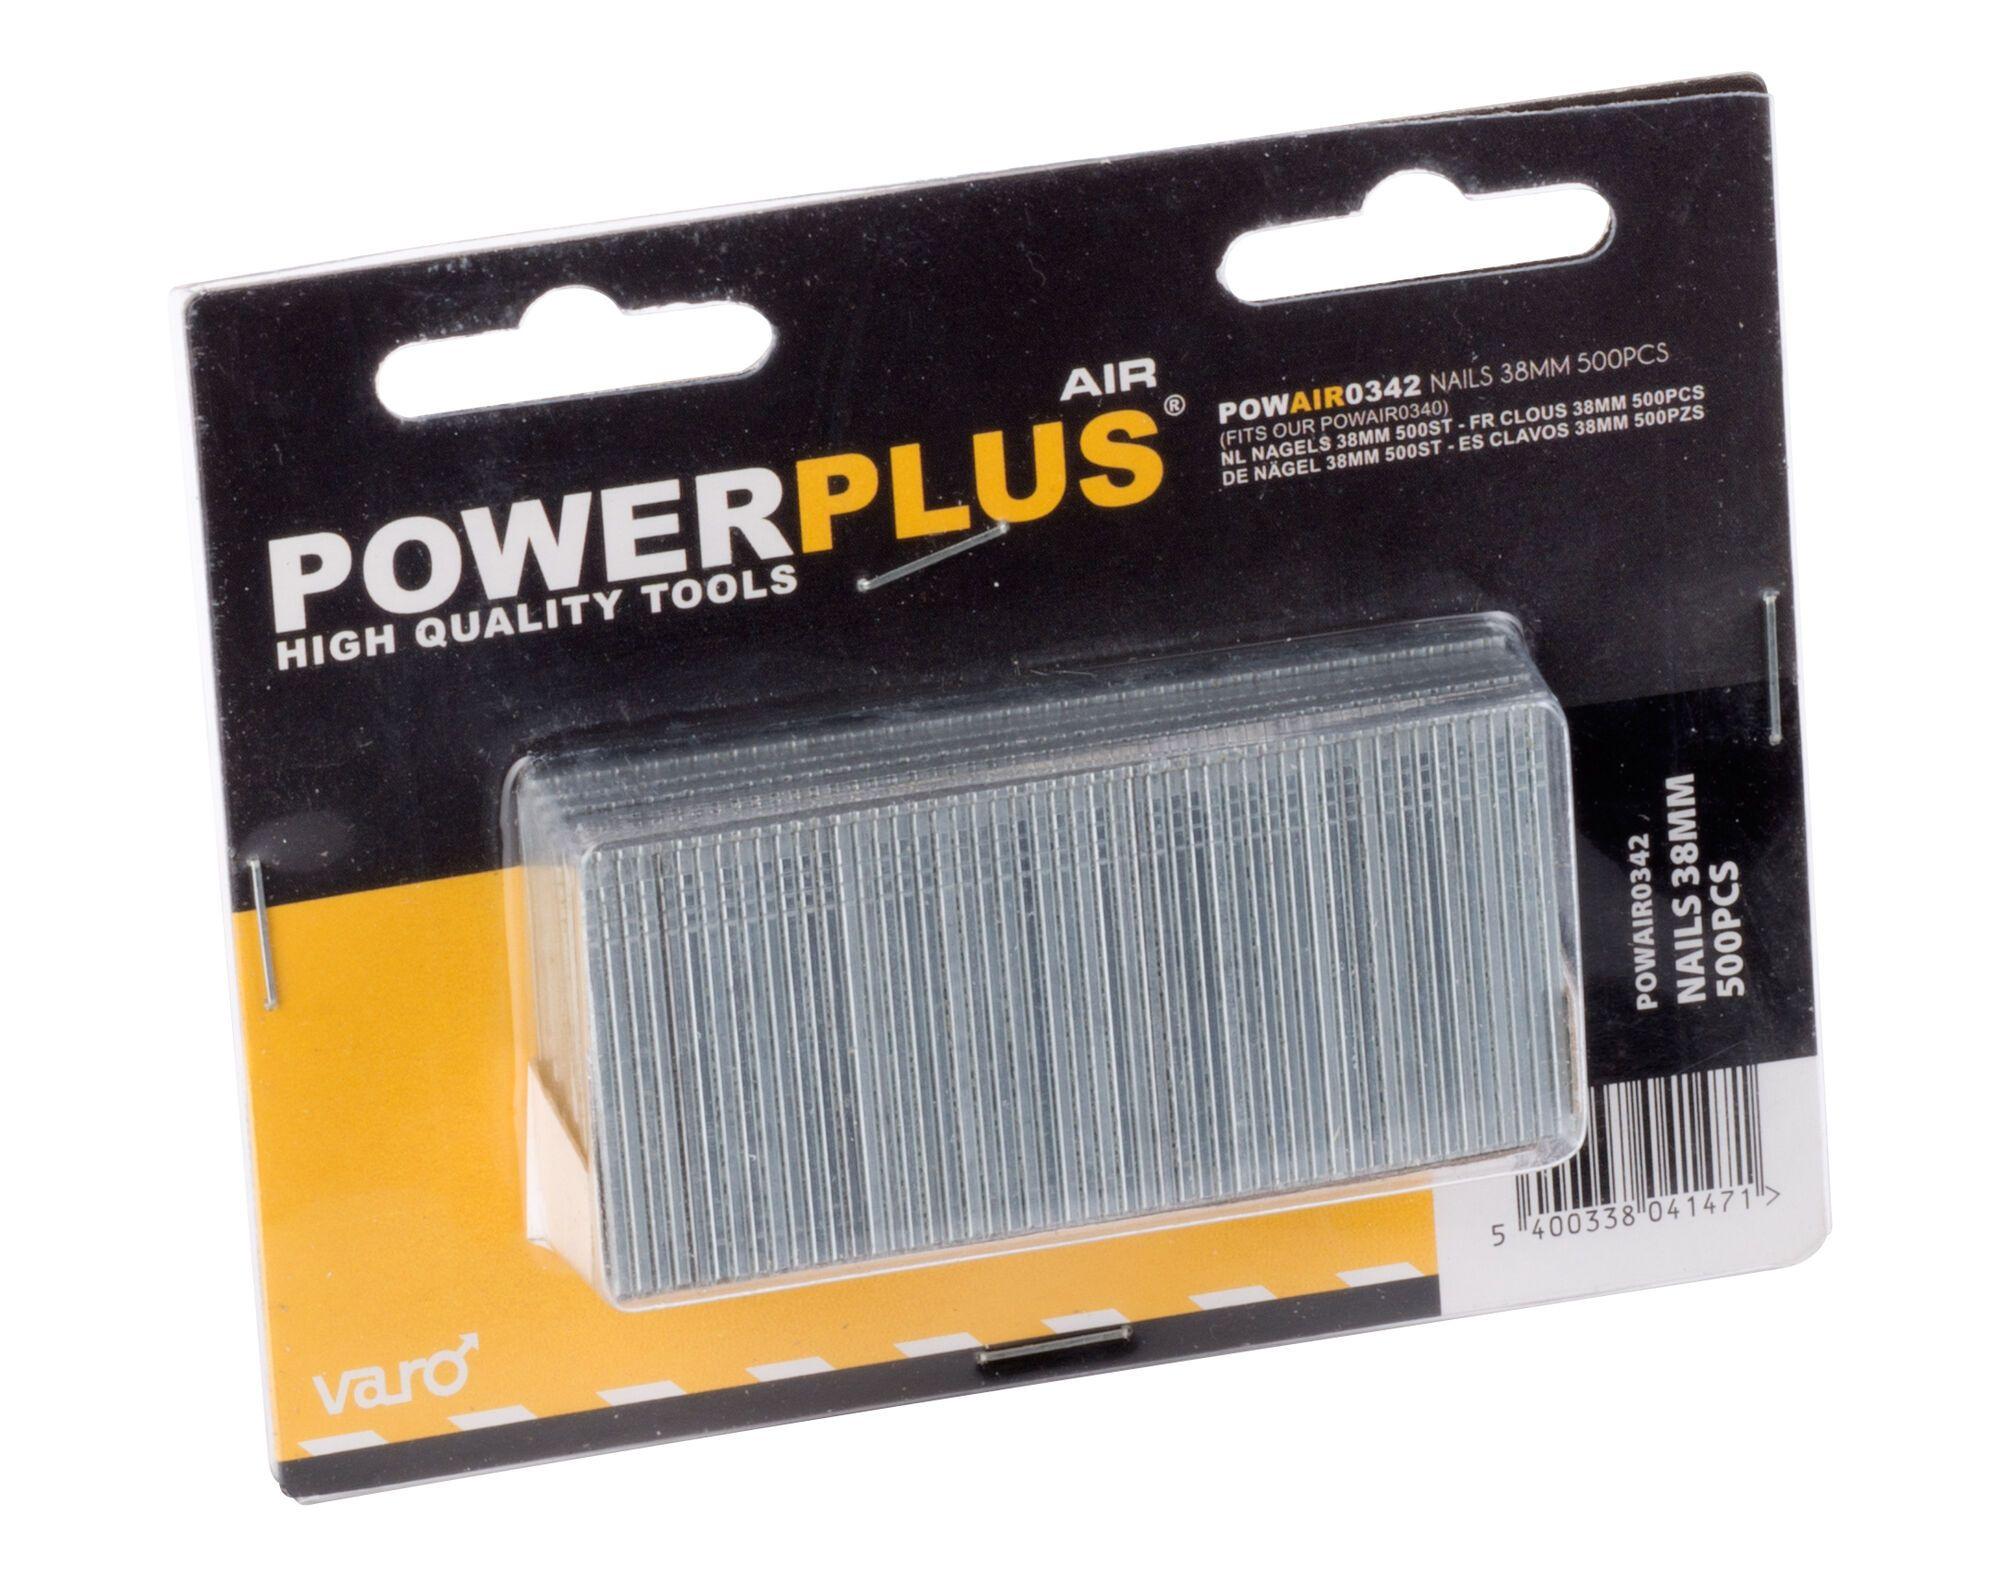 Powerplus POWAIR0342 500 Spijkers 38 mm | Stalen nagels voor nagelapparaat